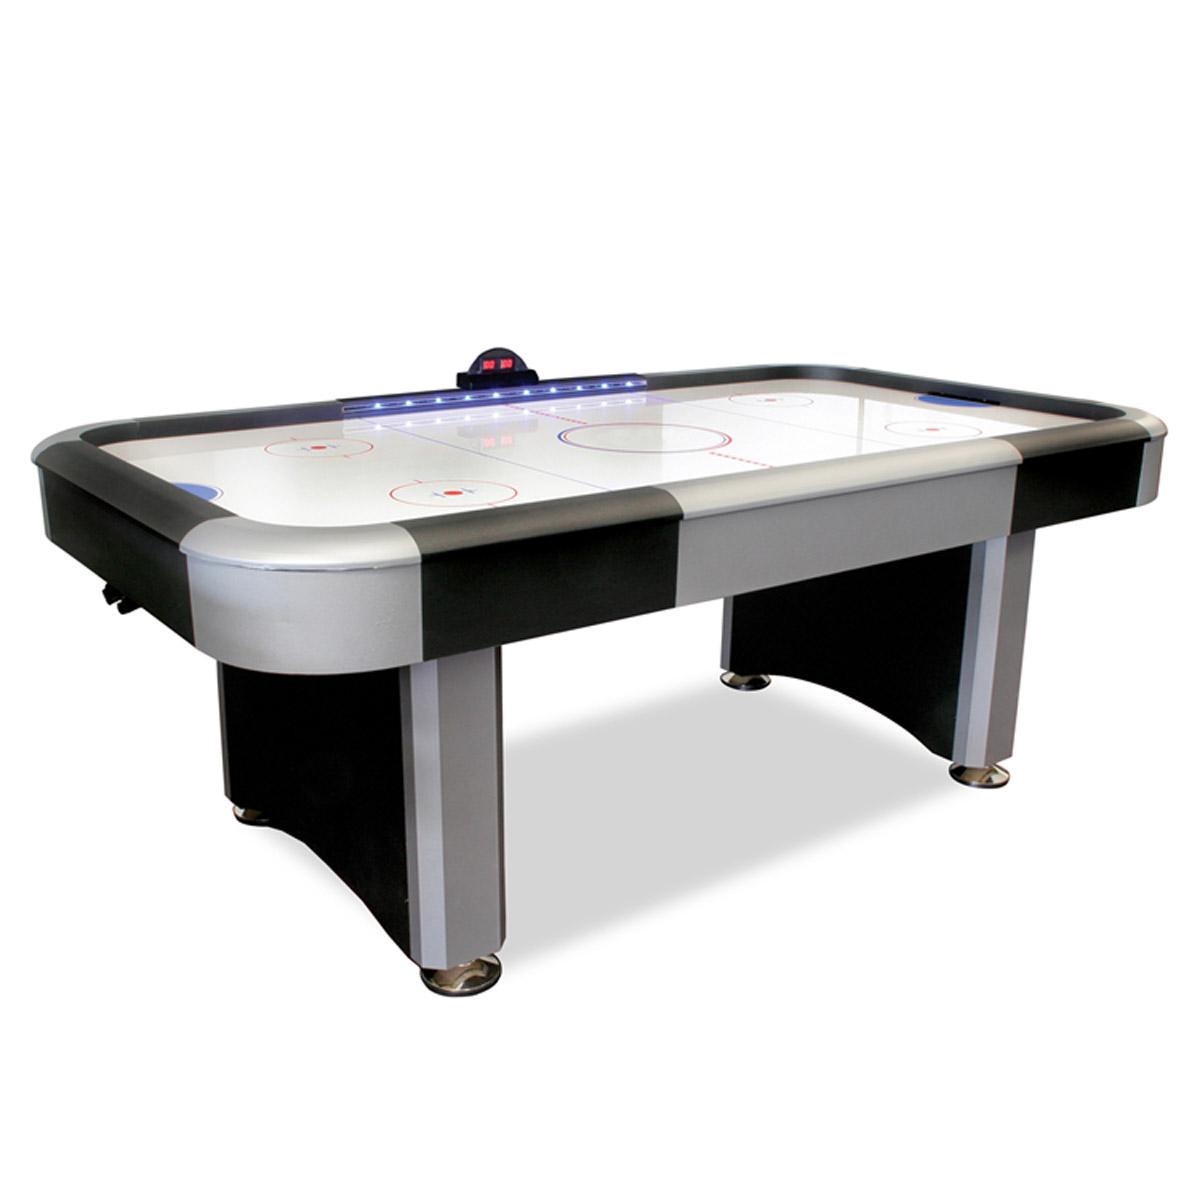 7 Electra Lighted Rail Air Hockey Table